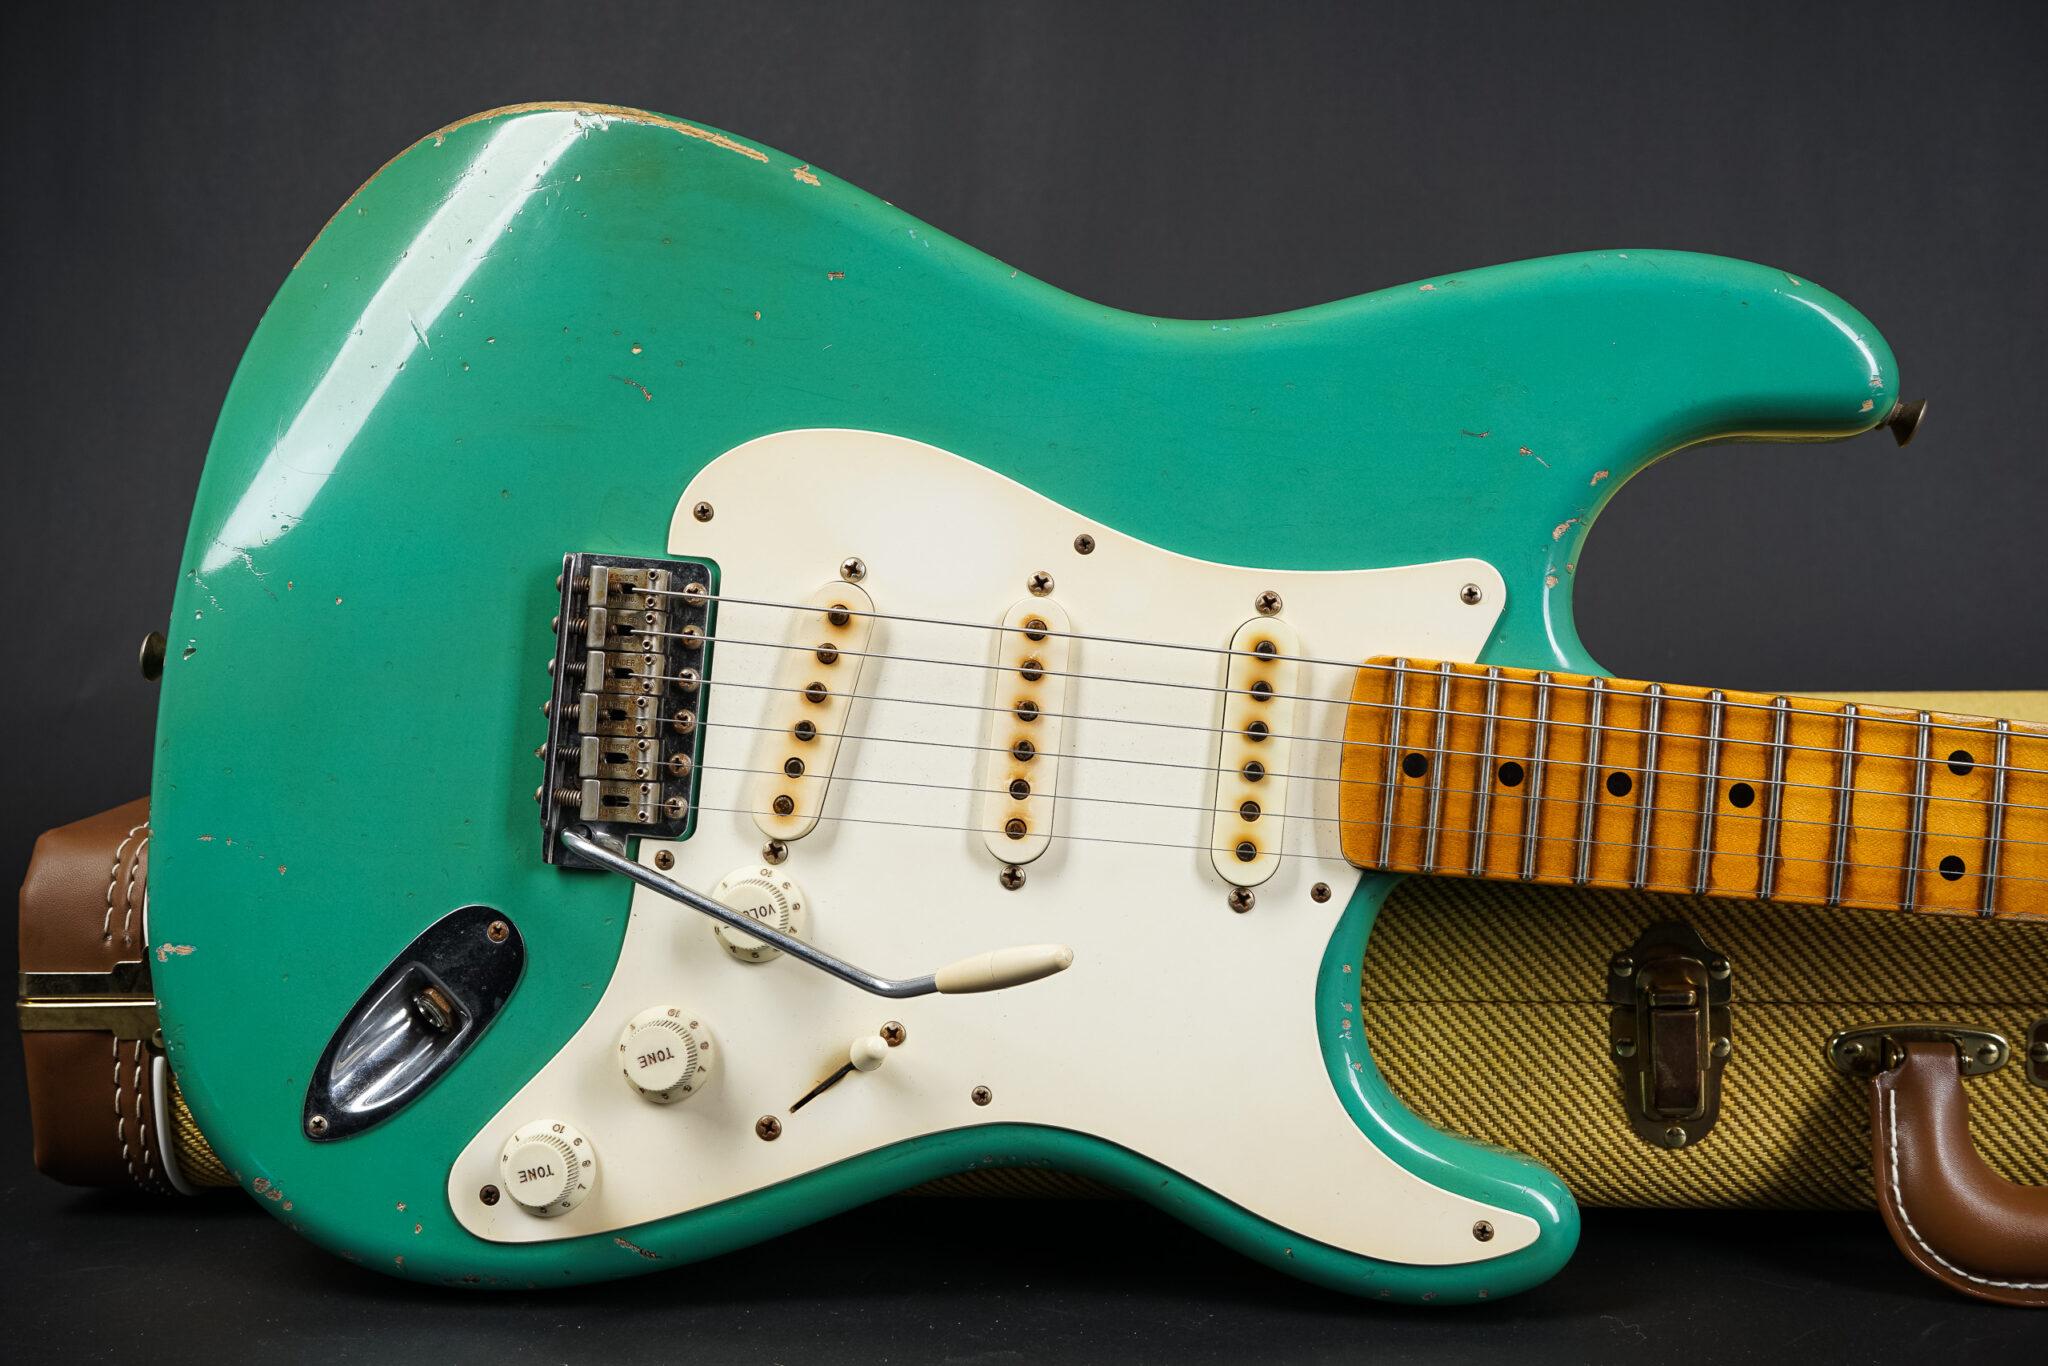 https://guitarpoint.de/app/uploads/products/2016-fender-john-cruz-masterbuilt-1955-stratocaster-foam-green-relic/2016-John-Cruz_Masterbuilt-55-Stratocaster-SFG-8-2048x1366.jpg